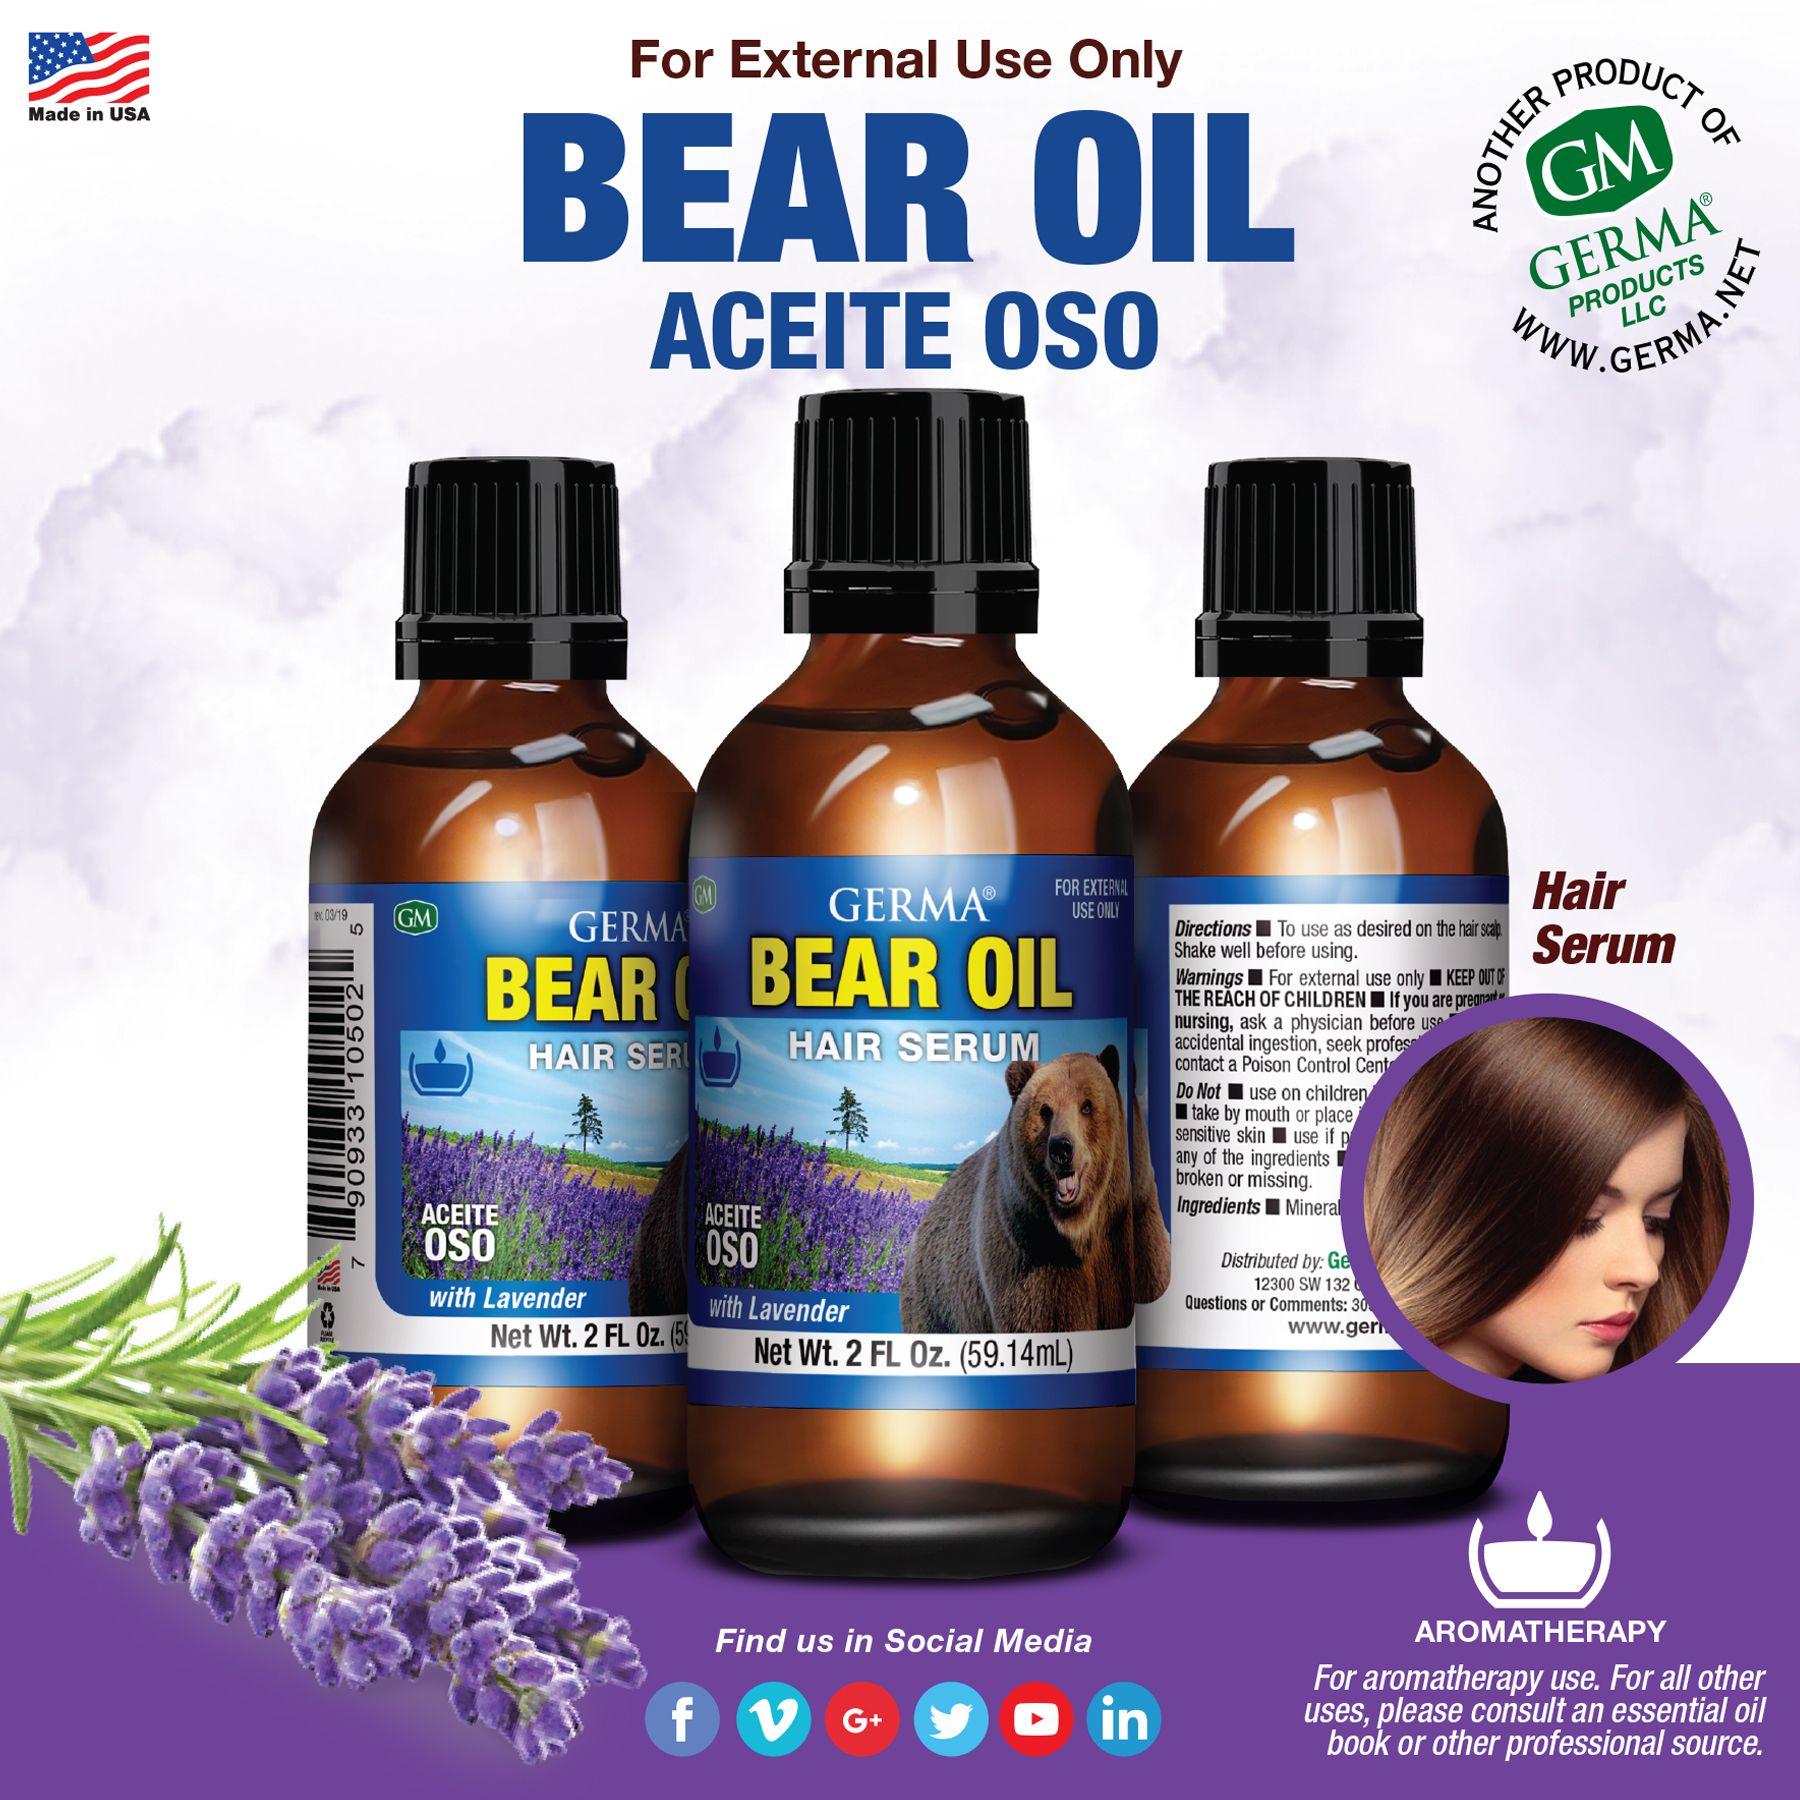 Germa Bear Oil 2oz Oils Shampoo Bottle Hair Serum